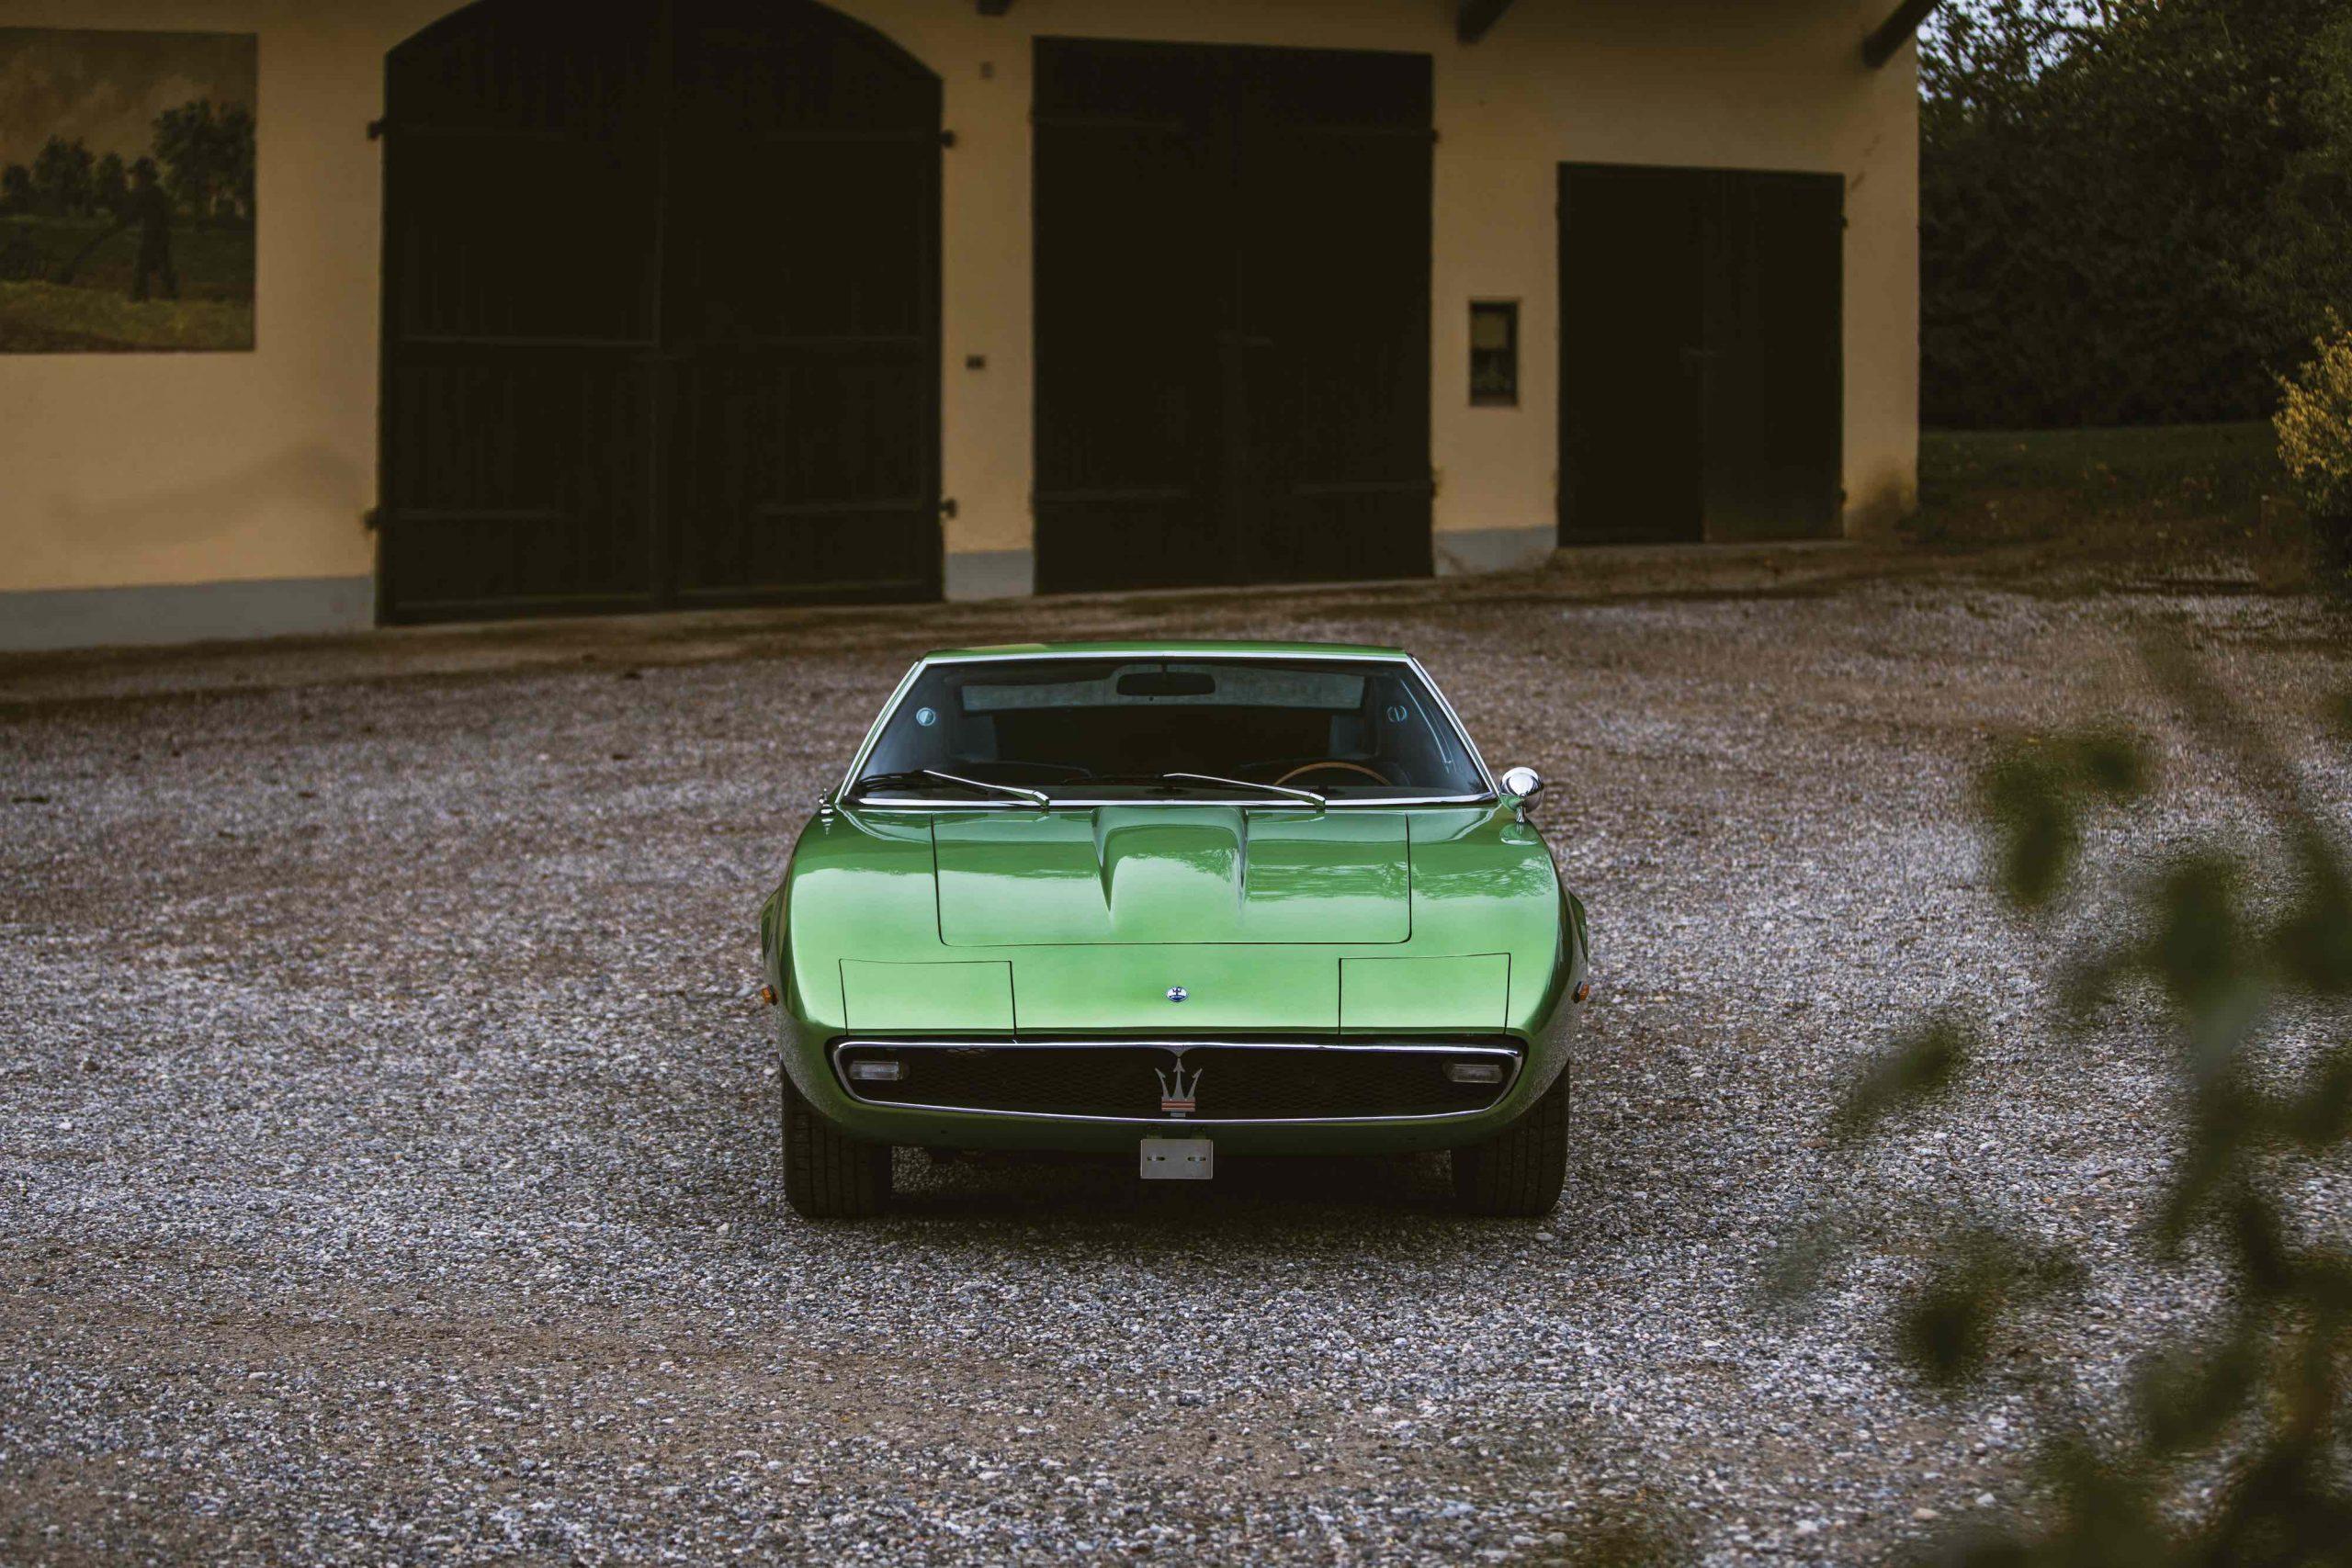 Maserati-Ghibli front